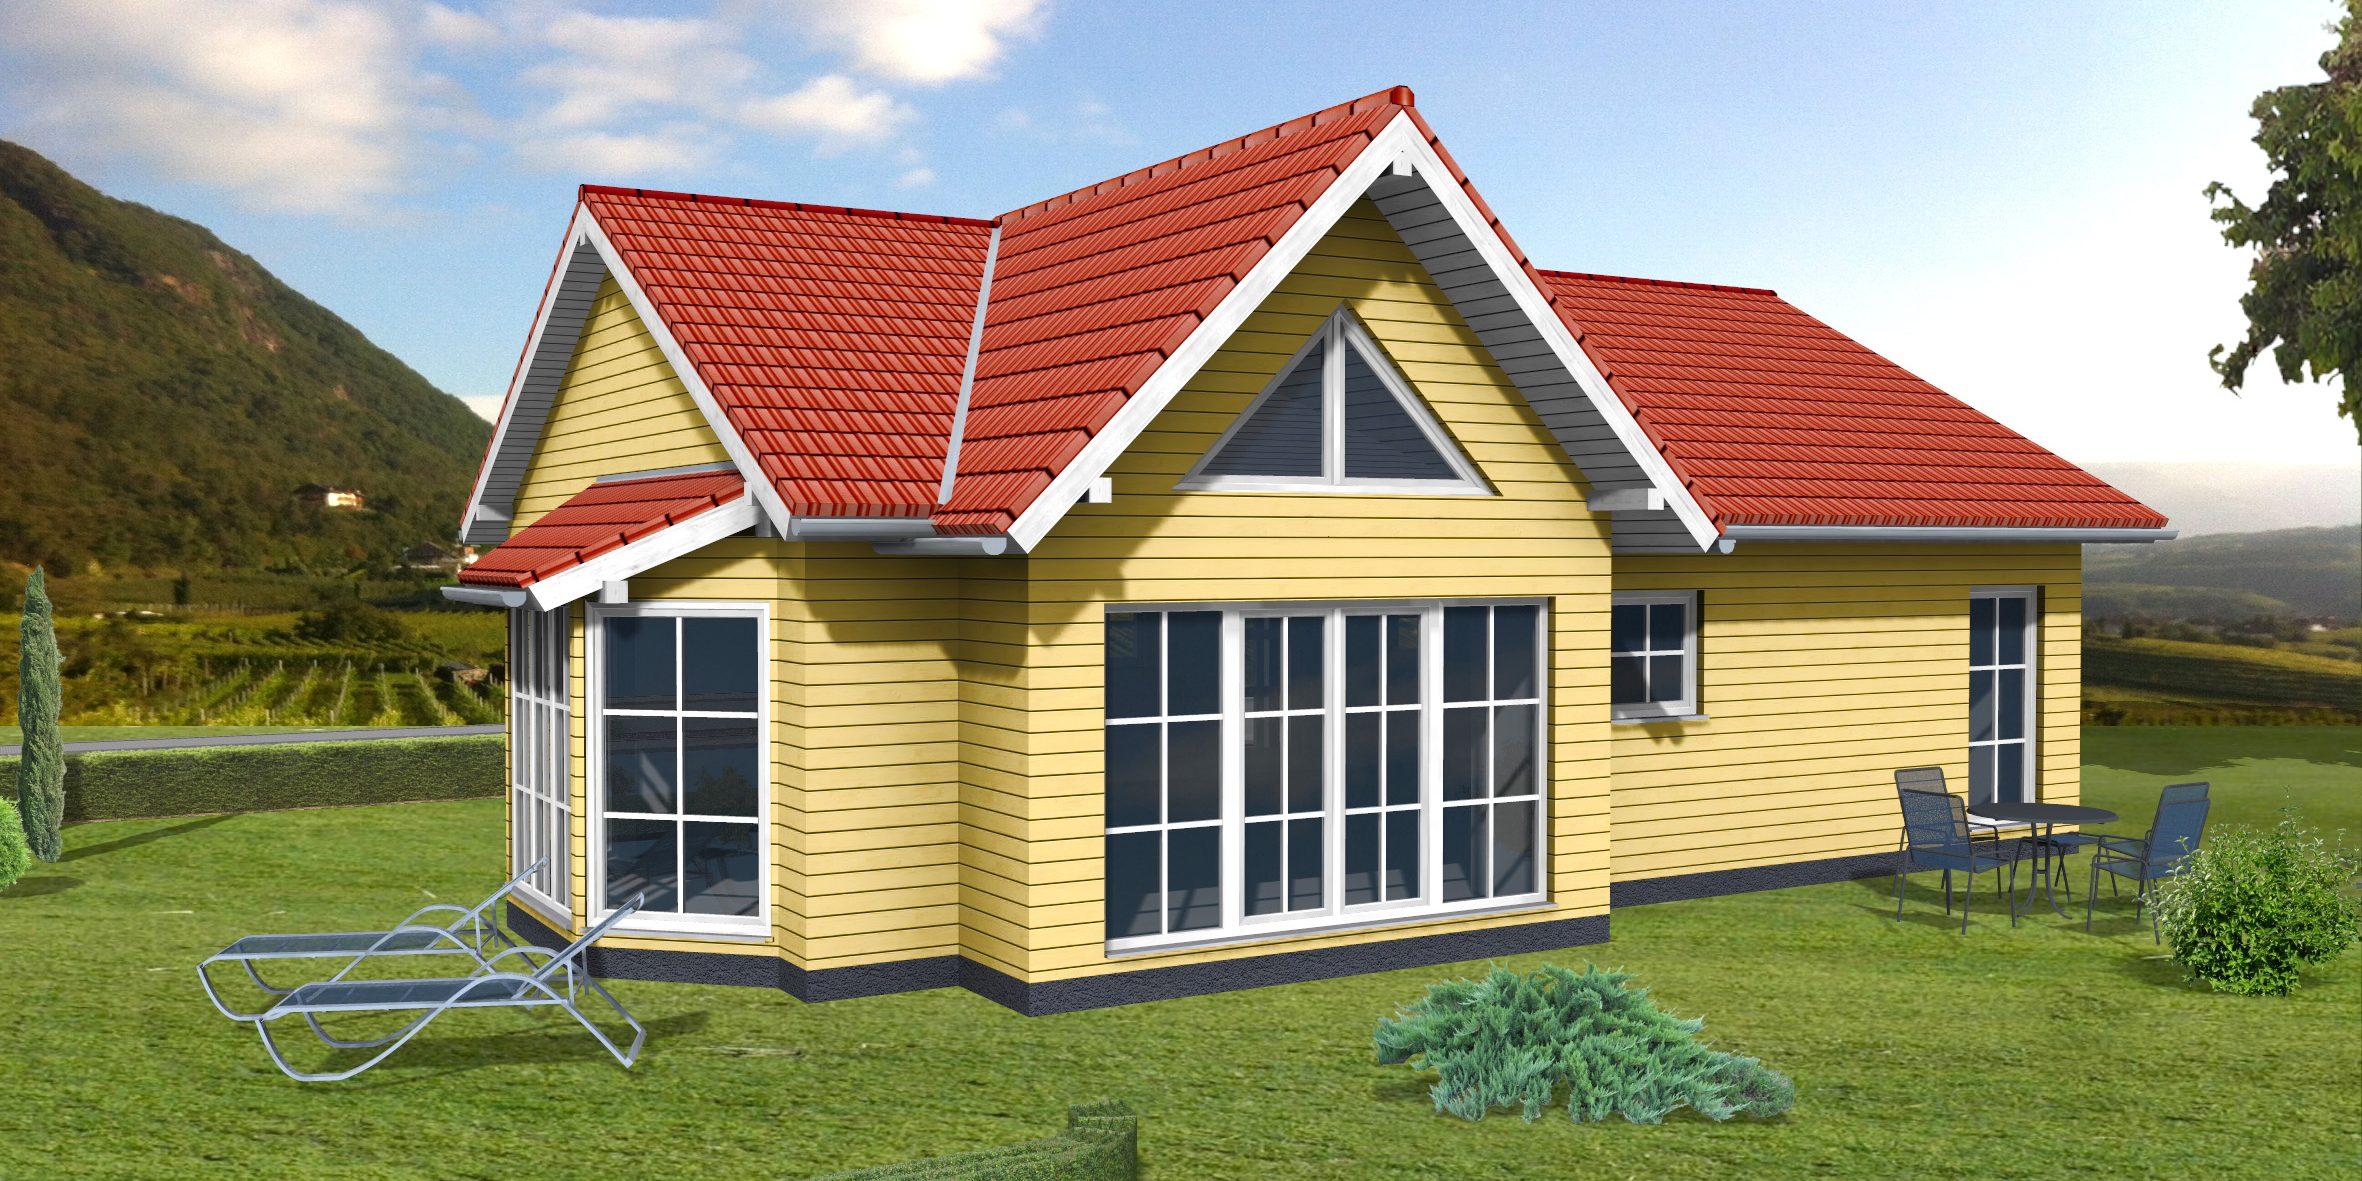 3D-Animation Rendering Wohnhaus